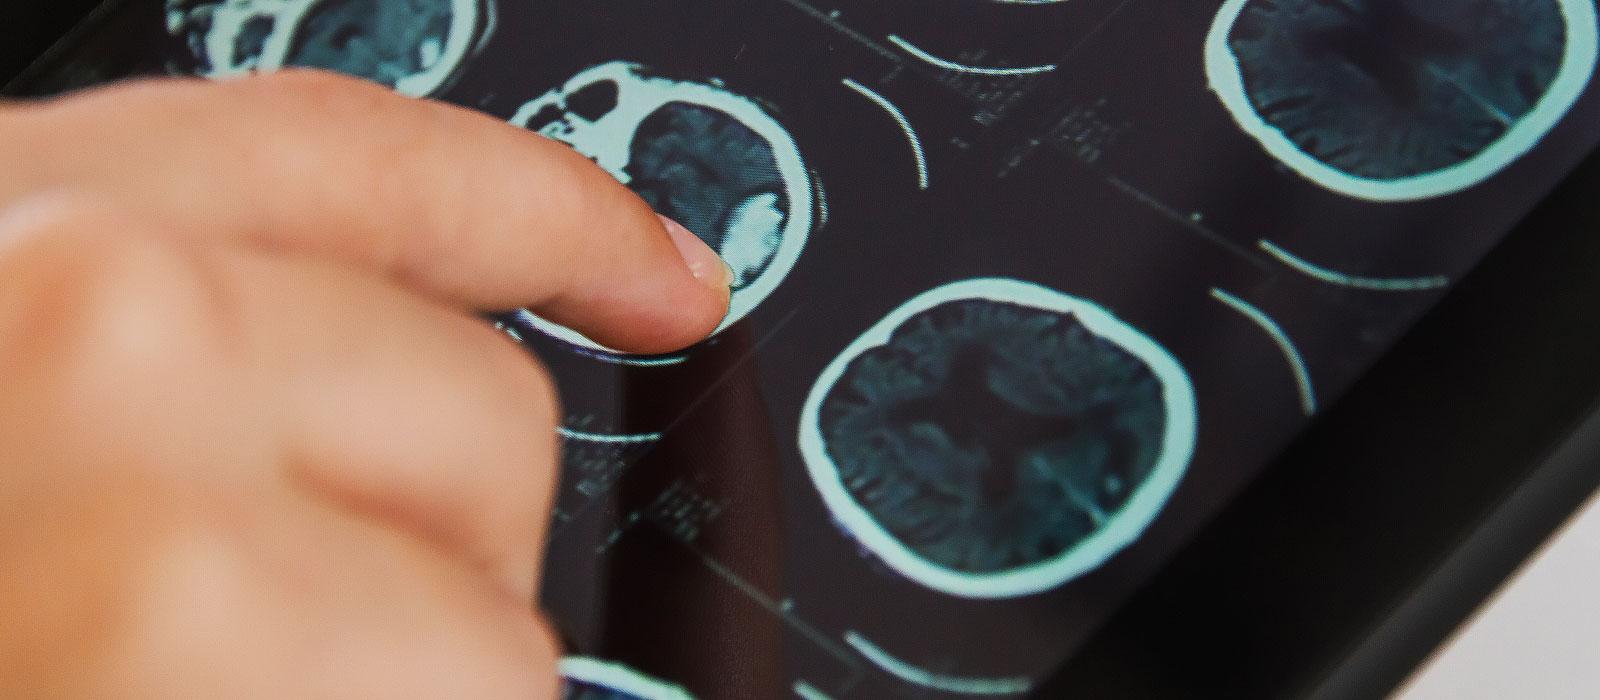 professore-neurologo-fabio-antonaci-medicina-cefalee-fondazione-mondino-emicrania-nevralgia-trigemino-7